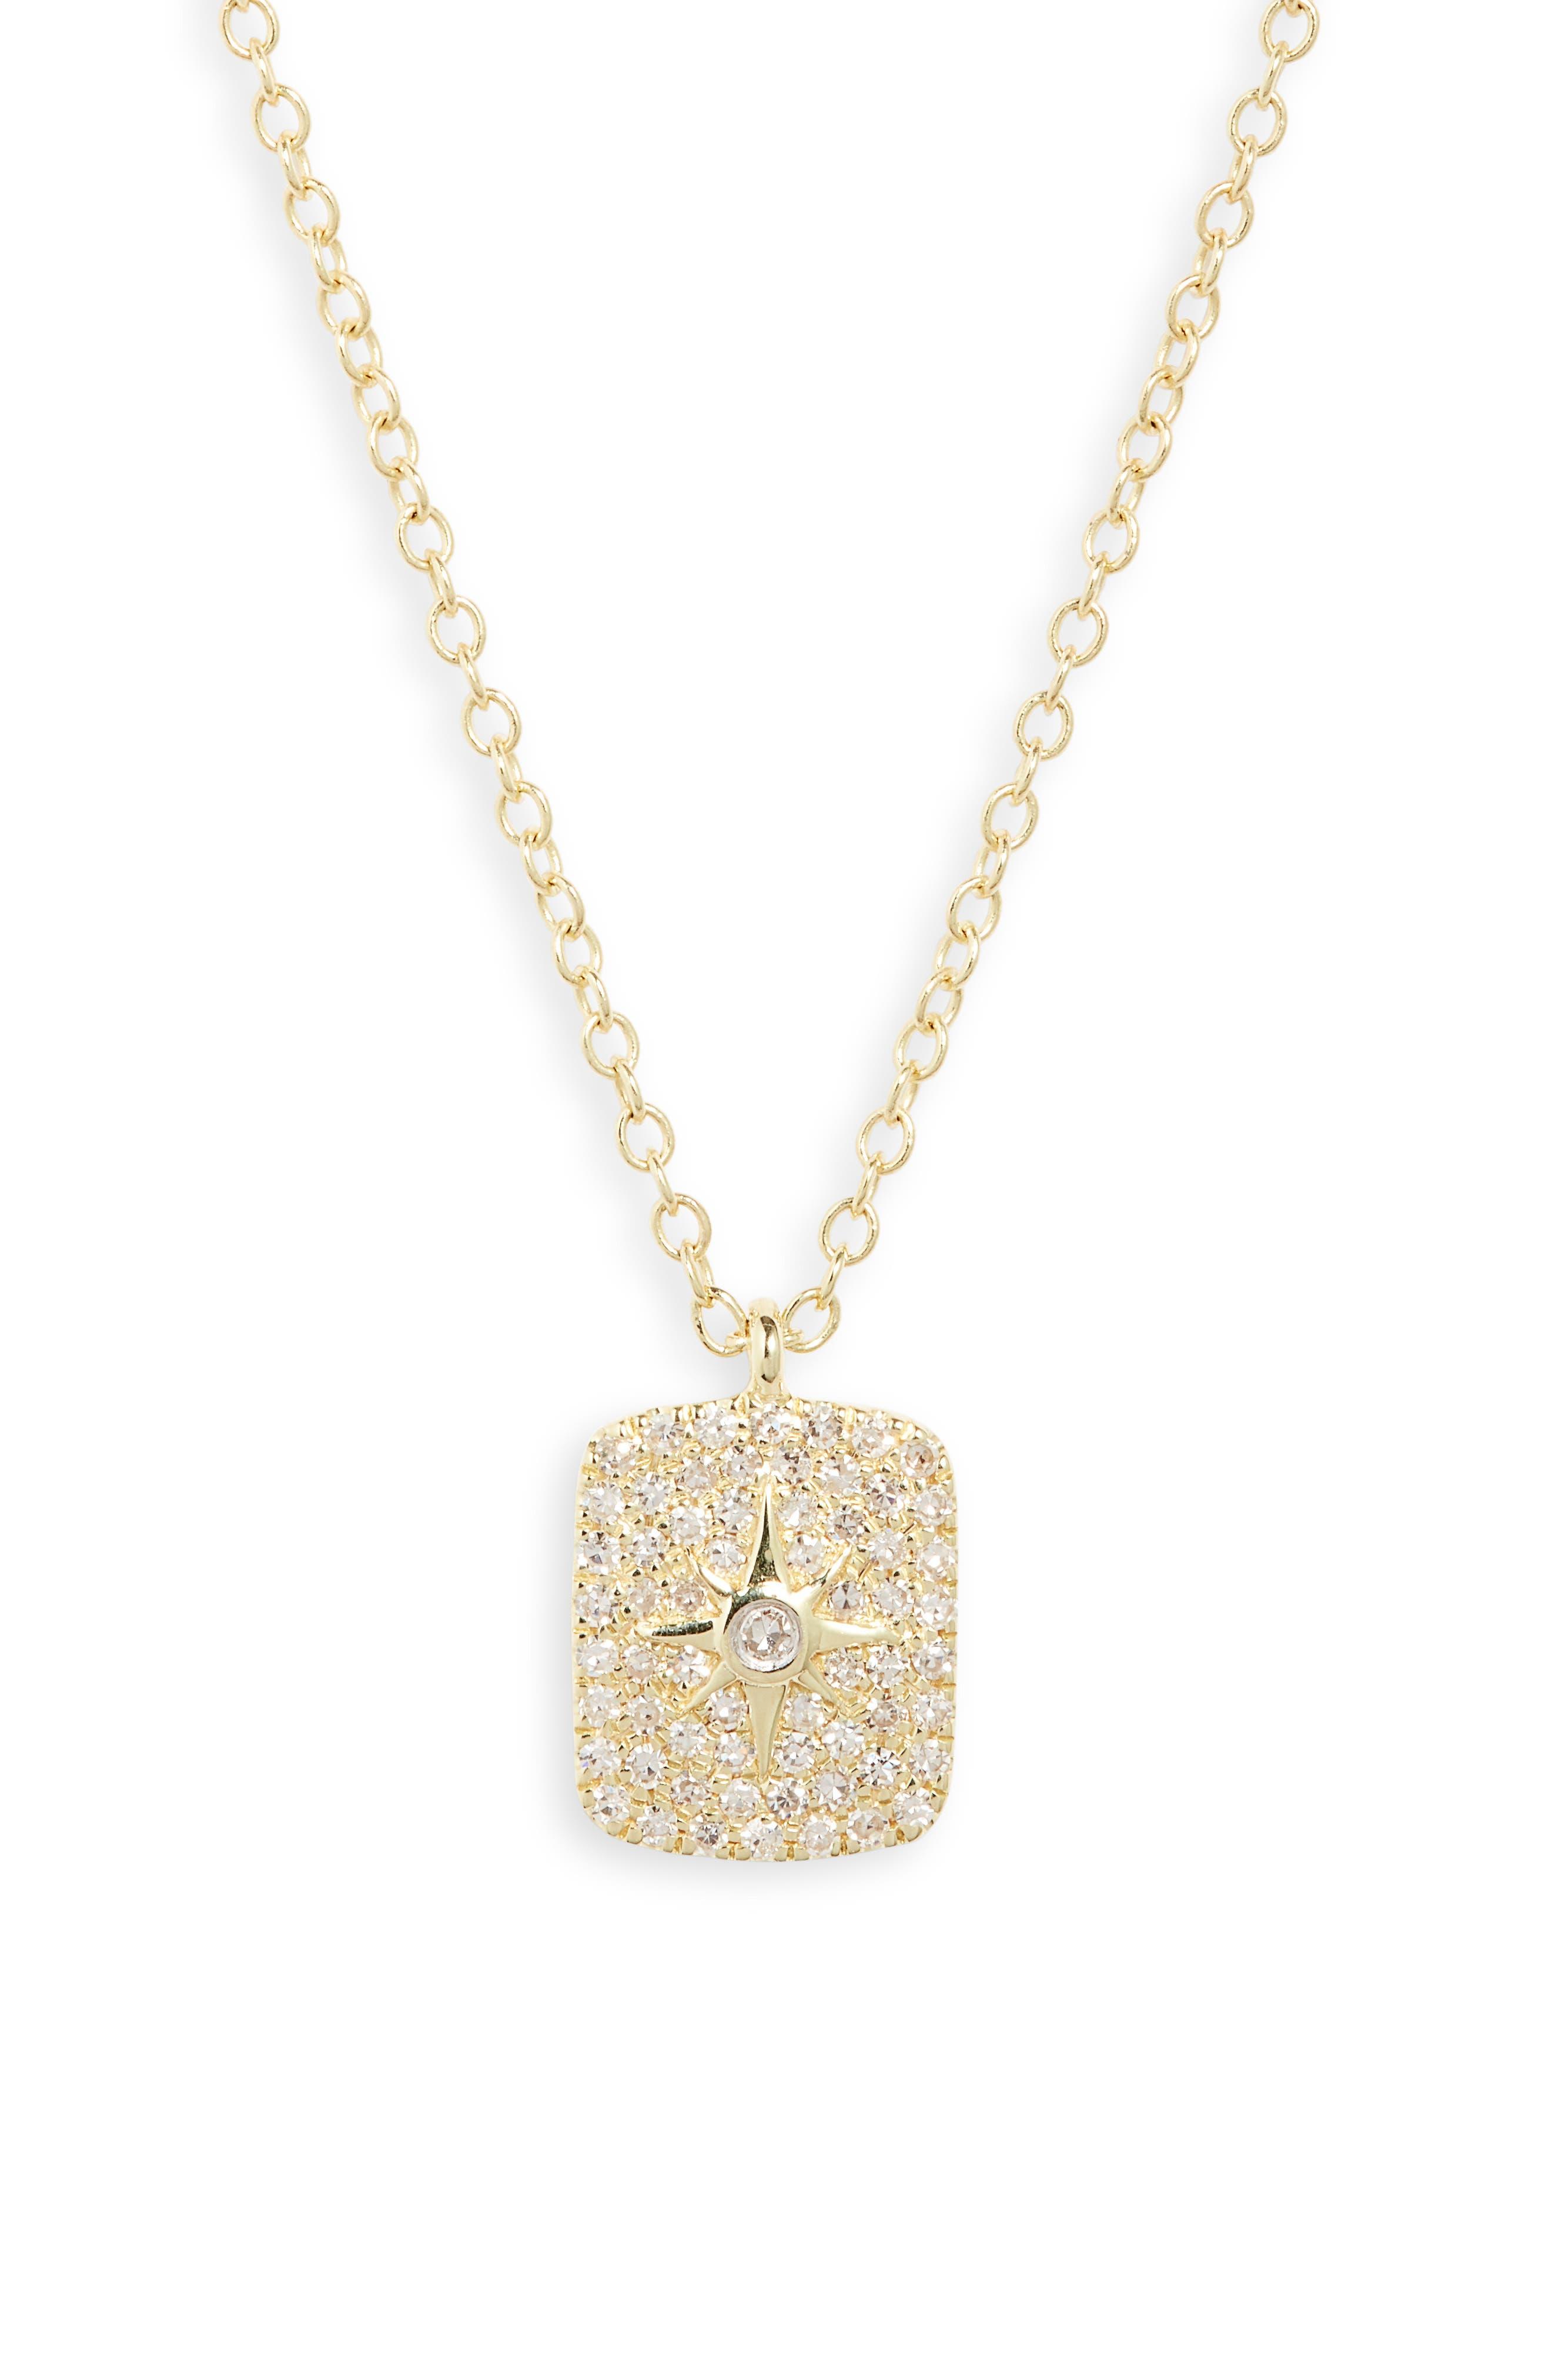 14K Gold & Diamond Pendant Necklace